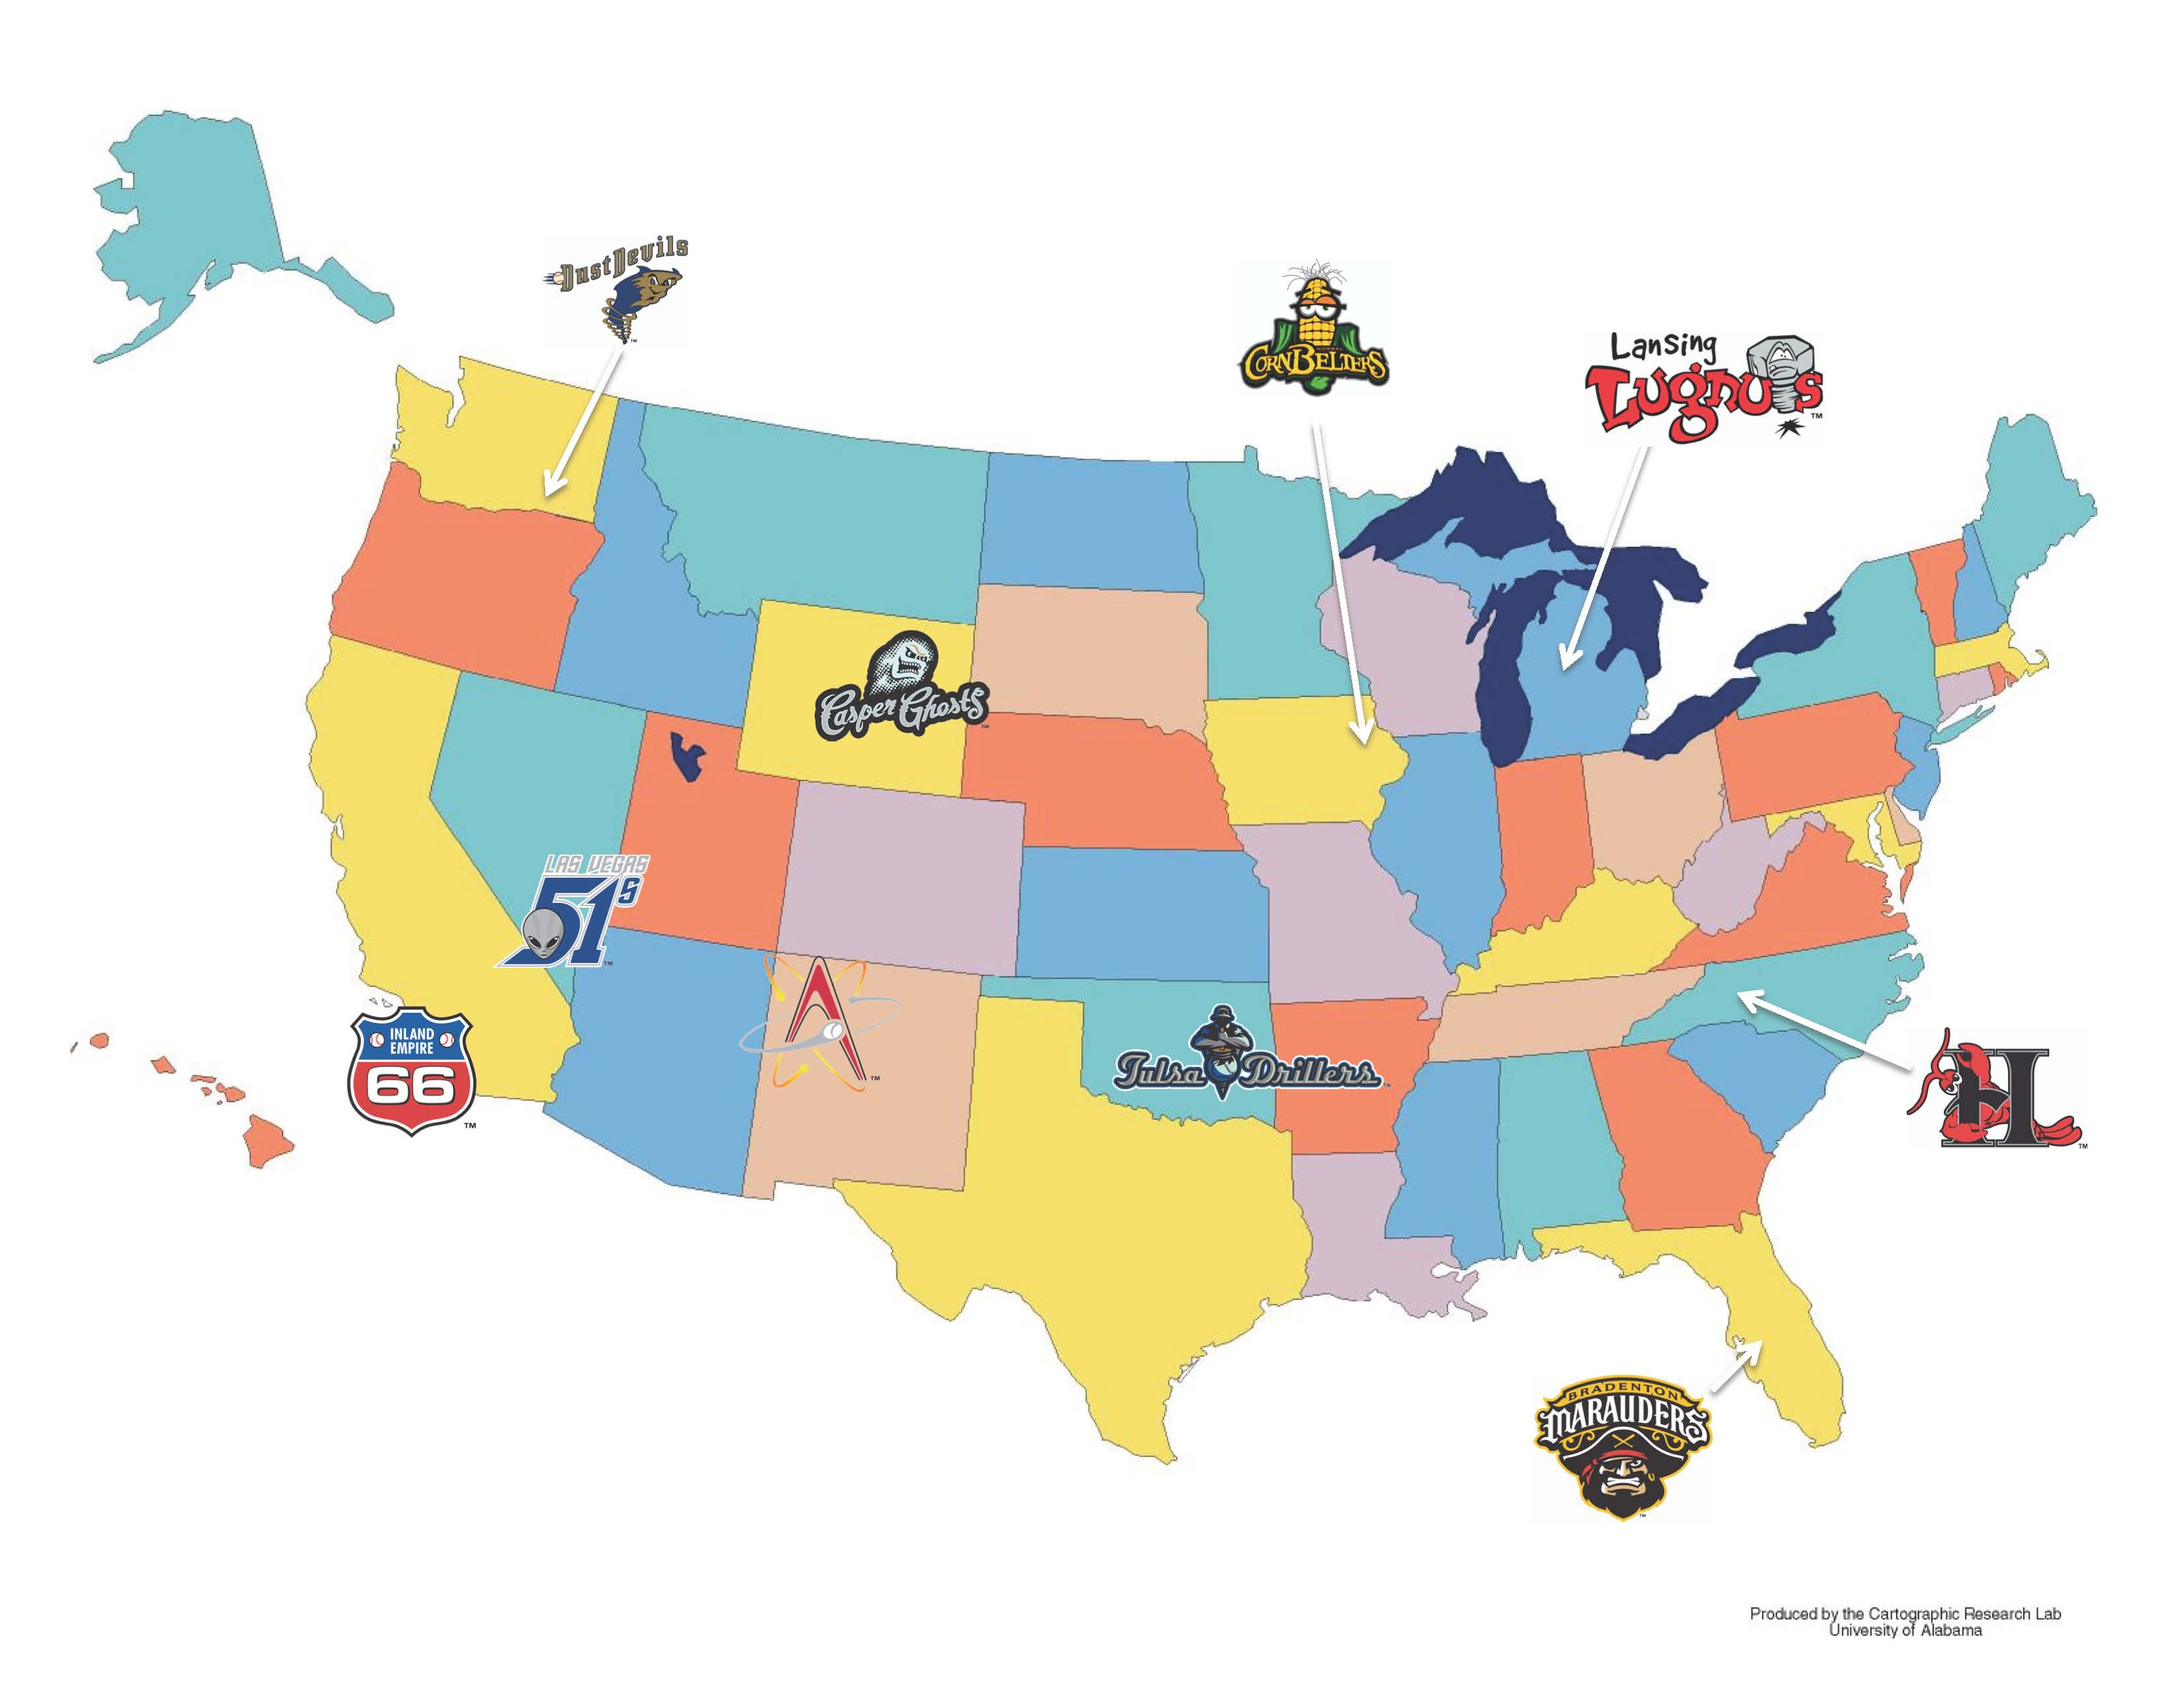 A minor league logo tour of the U.S.A